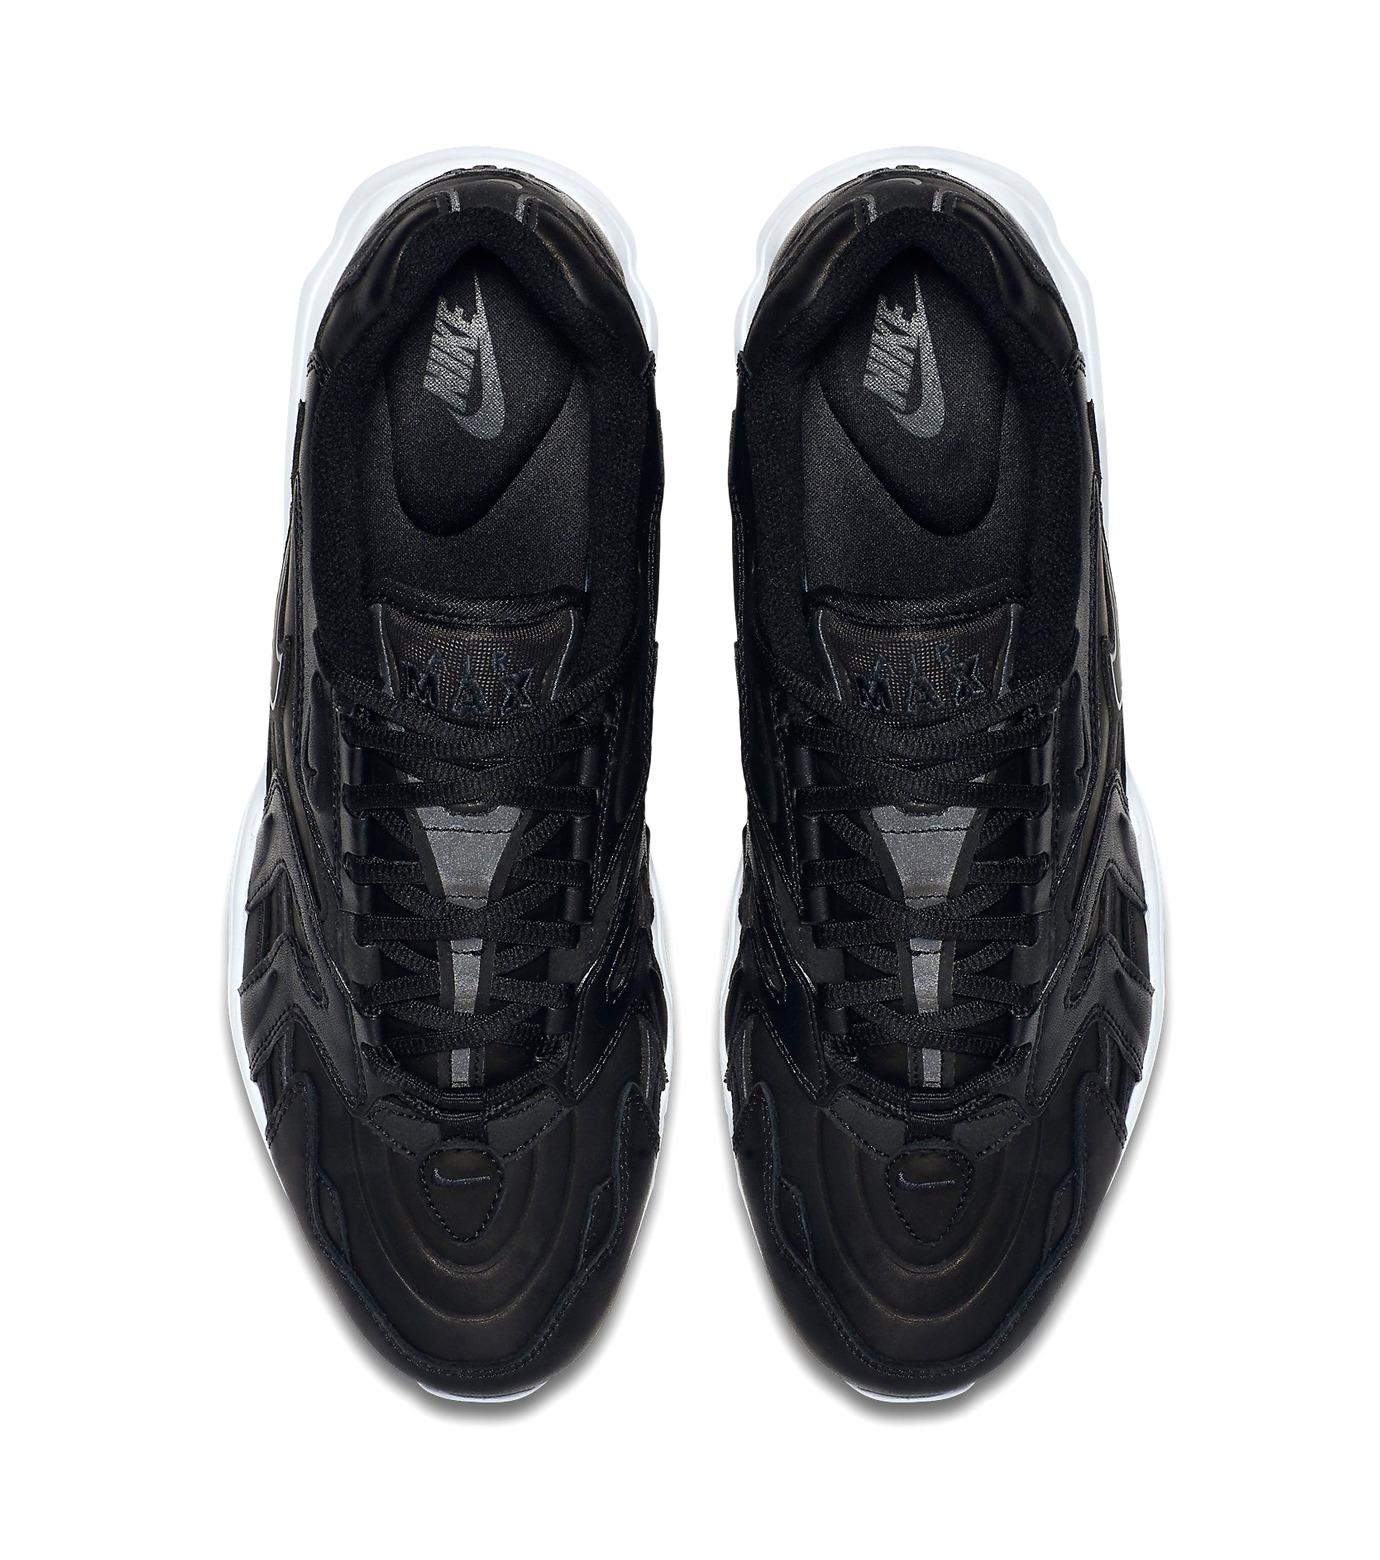 NIKE(ナイキ)のAIR MAX 96 II XX-BLACK(シューズ/shoes)-870166-001-13 拡大詳細画像4